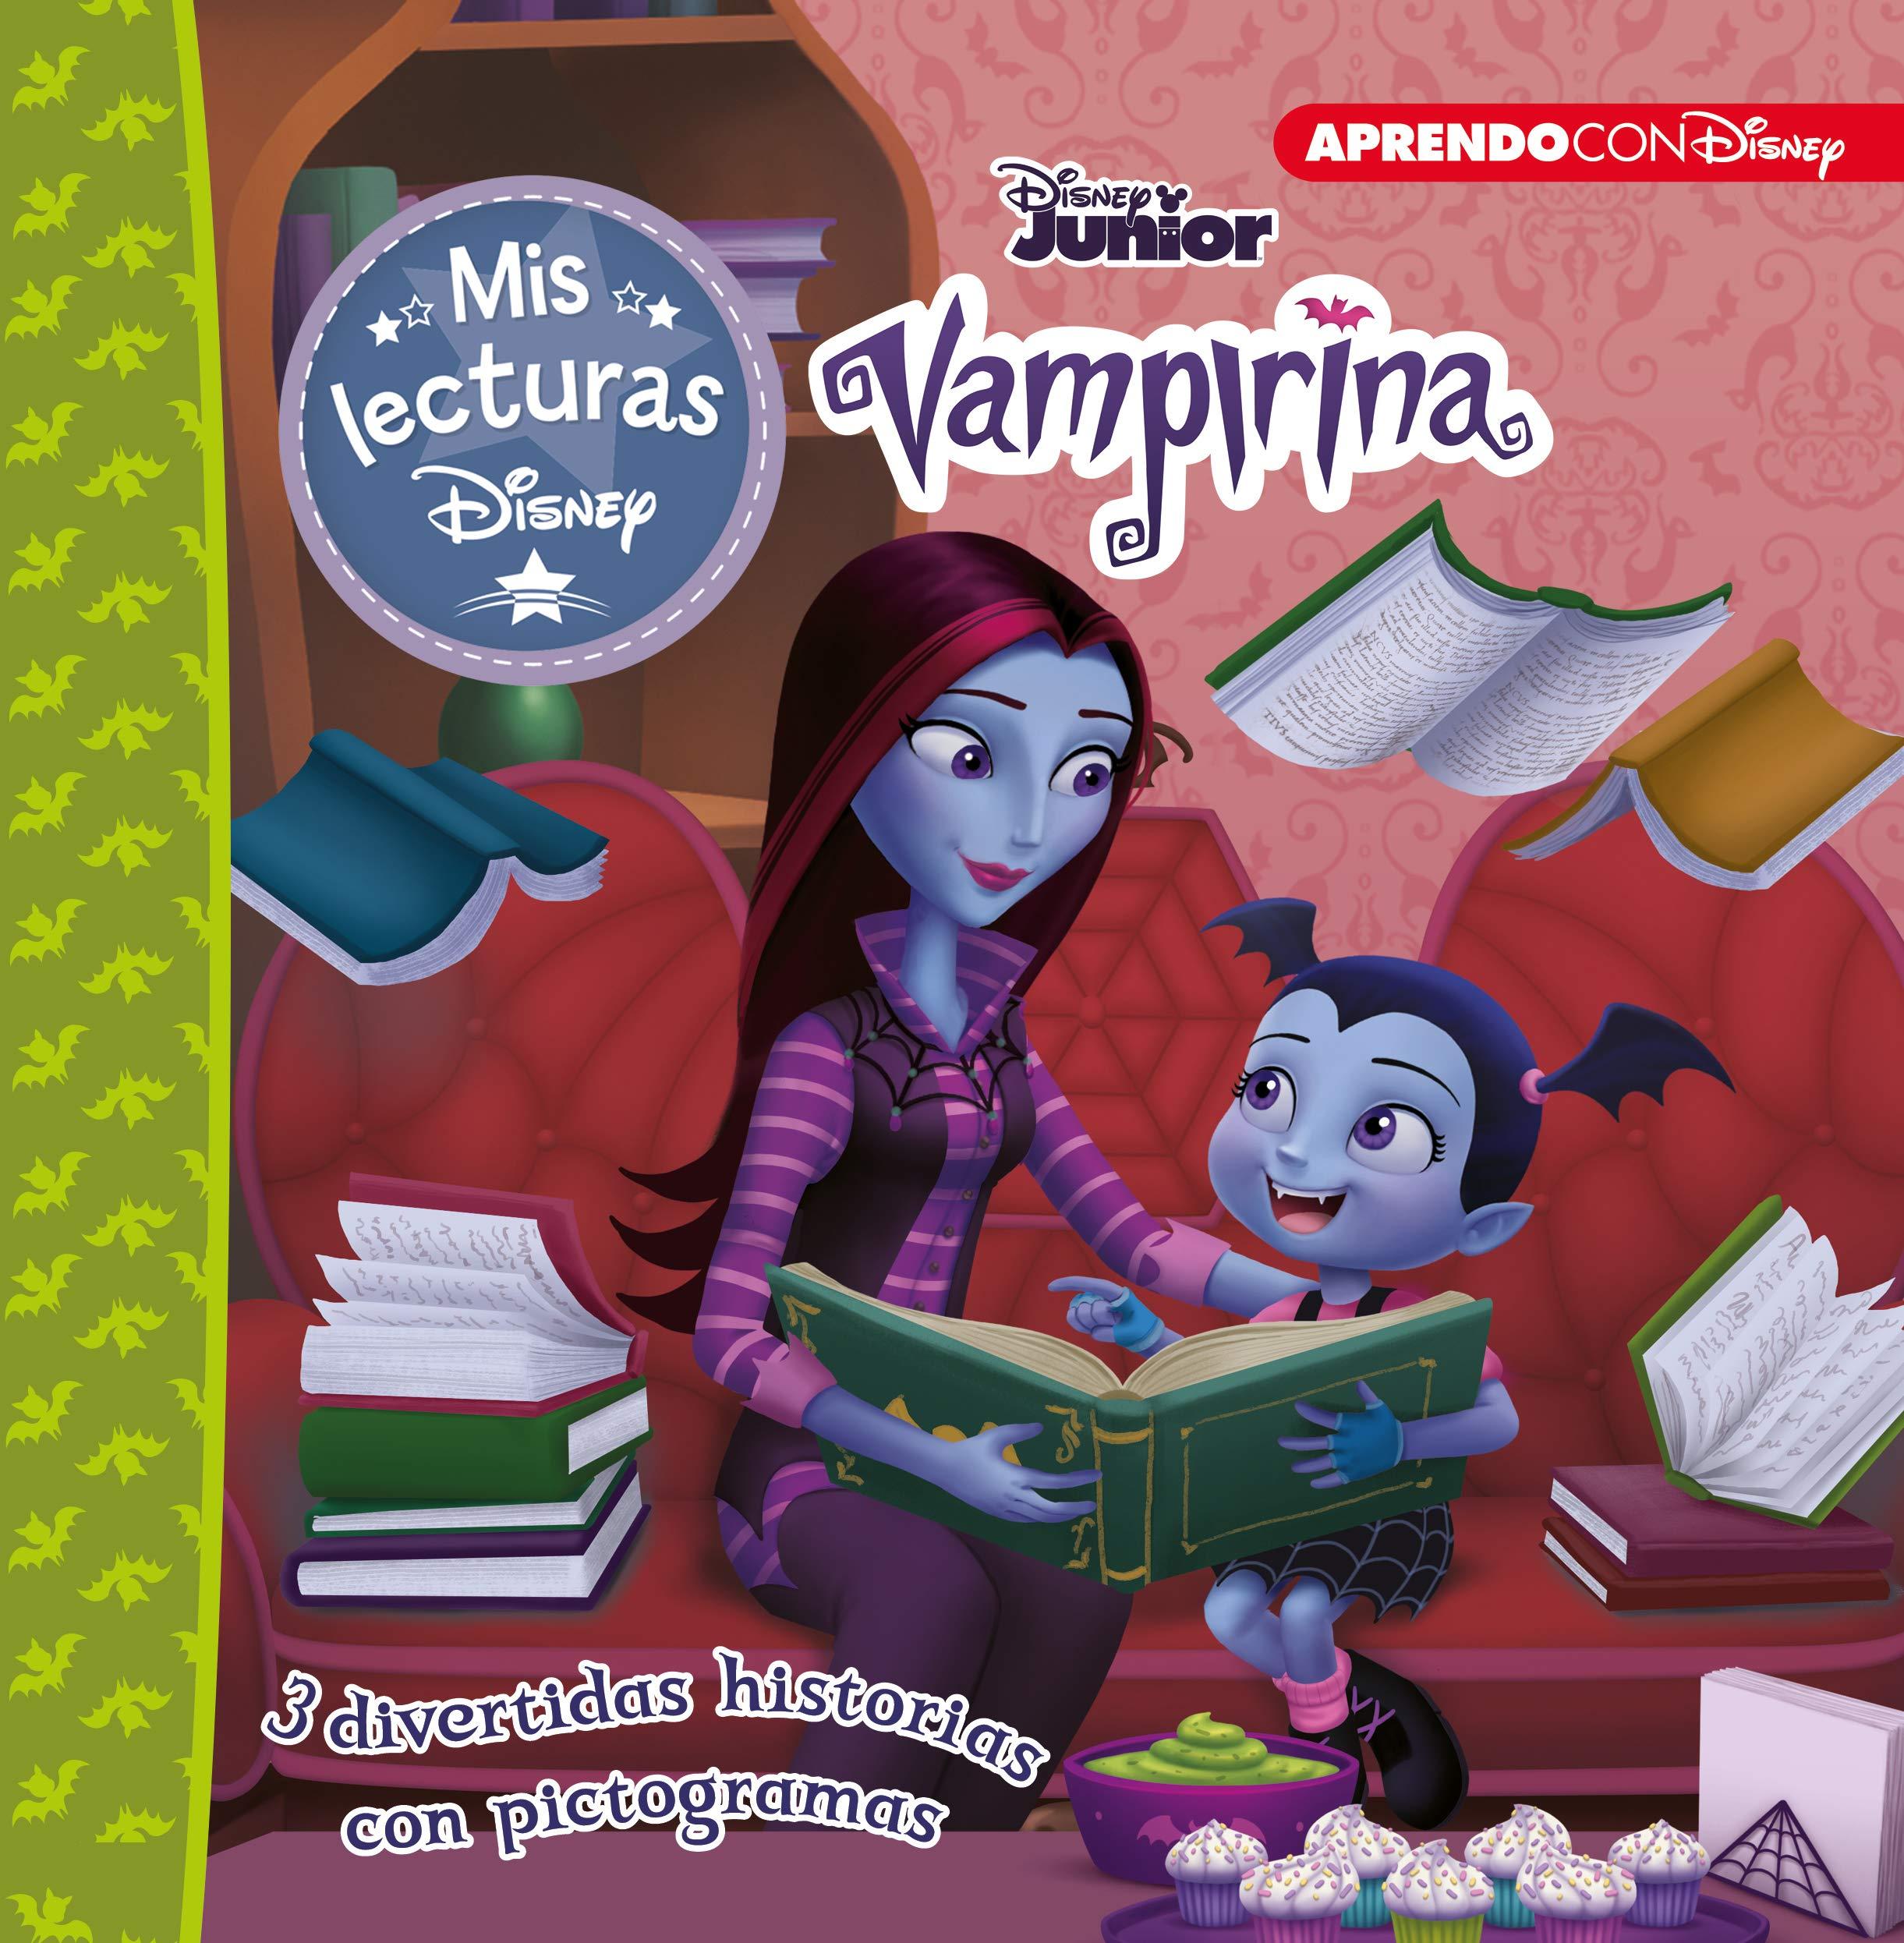 Vampirina (Mis lecturas Disney): 3 divertidas historias con pictogramas: Las chicas Lúgubrez, Hogar vampi-hogar y Ya llega Halloween